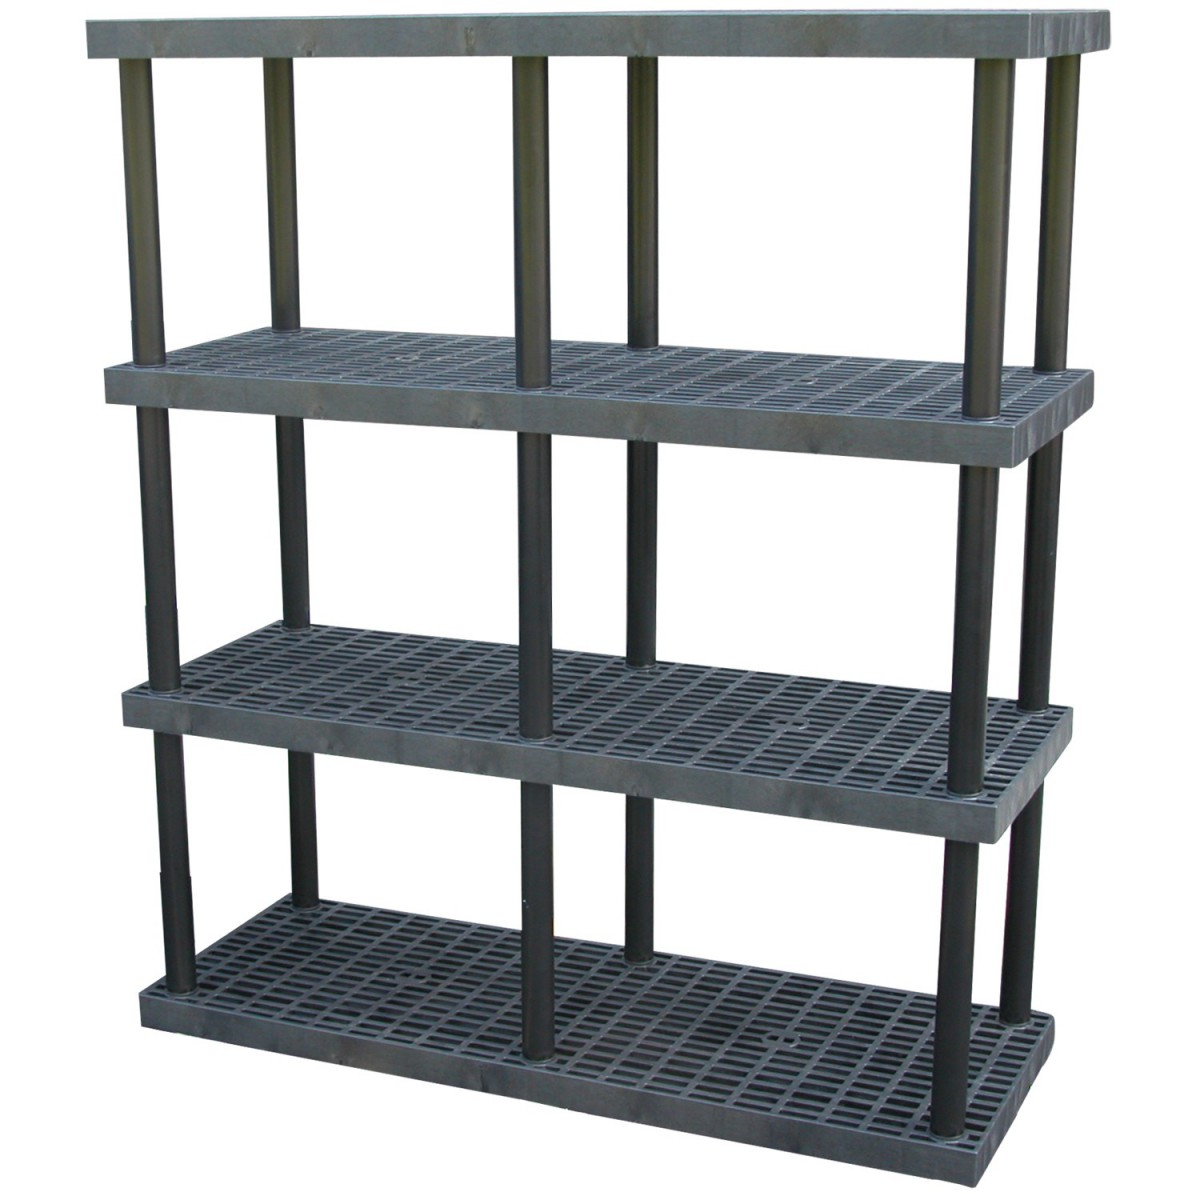 shelves shelving warehouse shelves office shelves. Black Bedroom Furniture Sets. Home Design Ideas